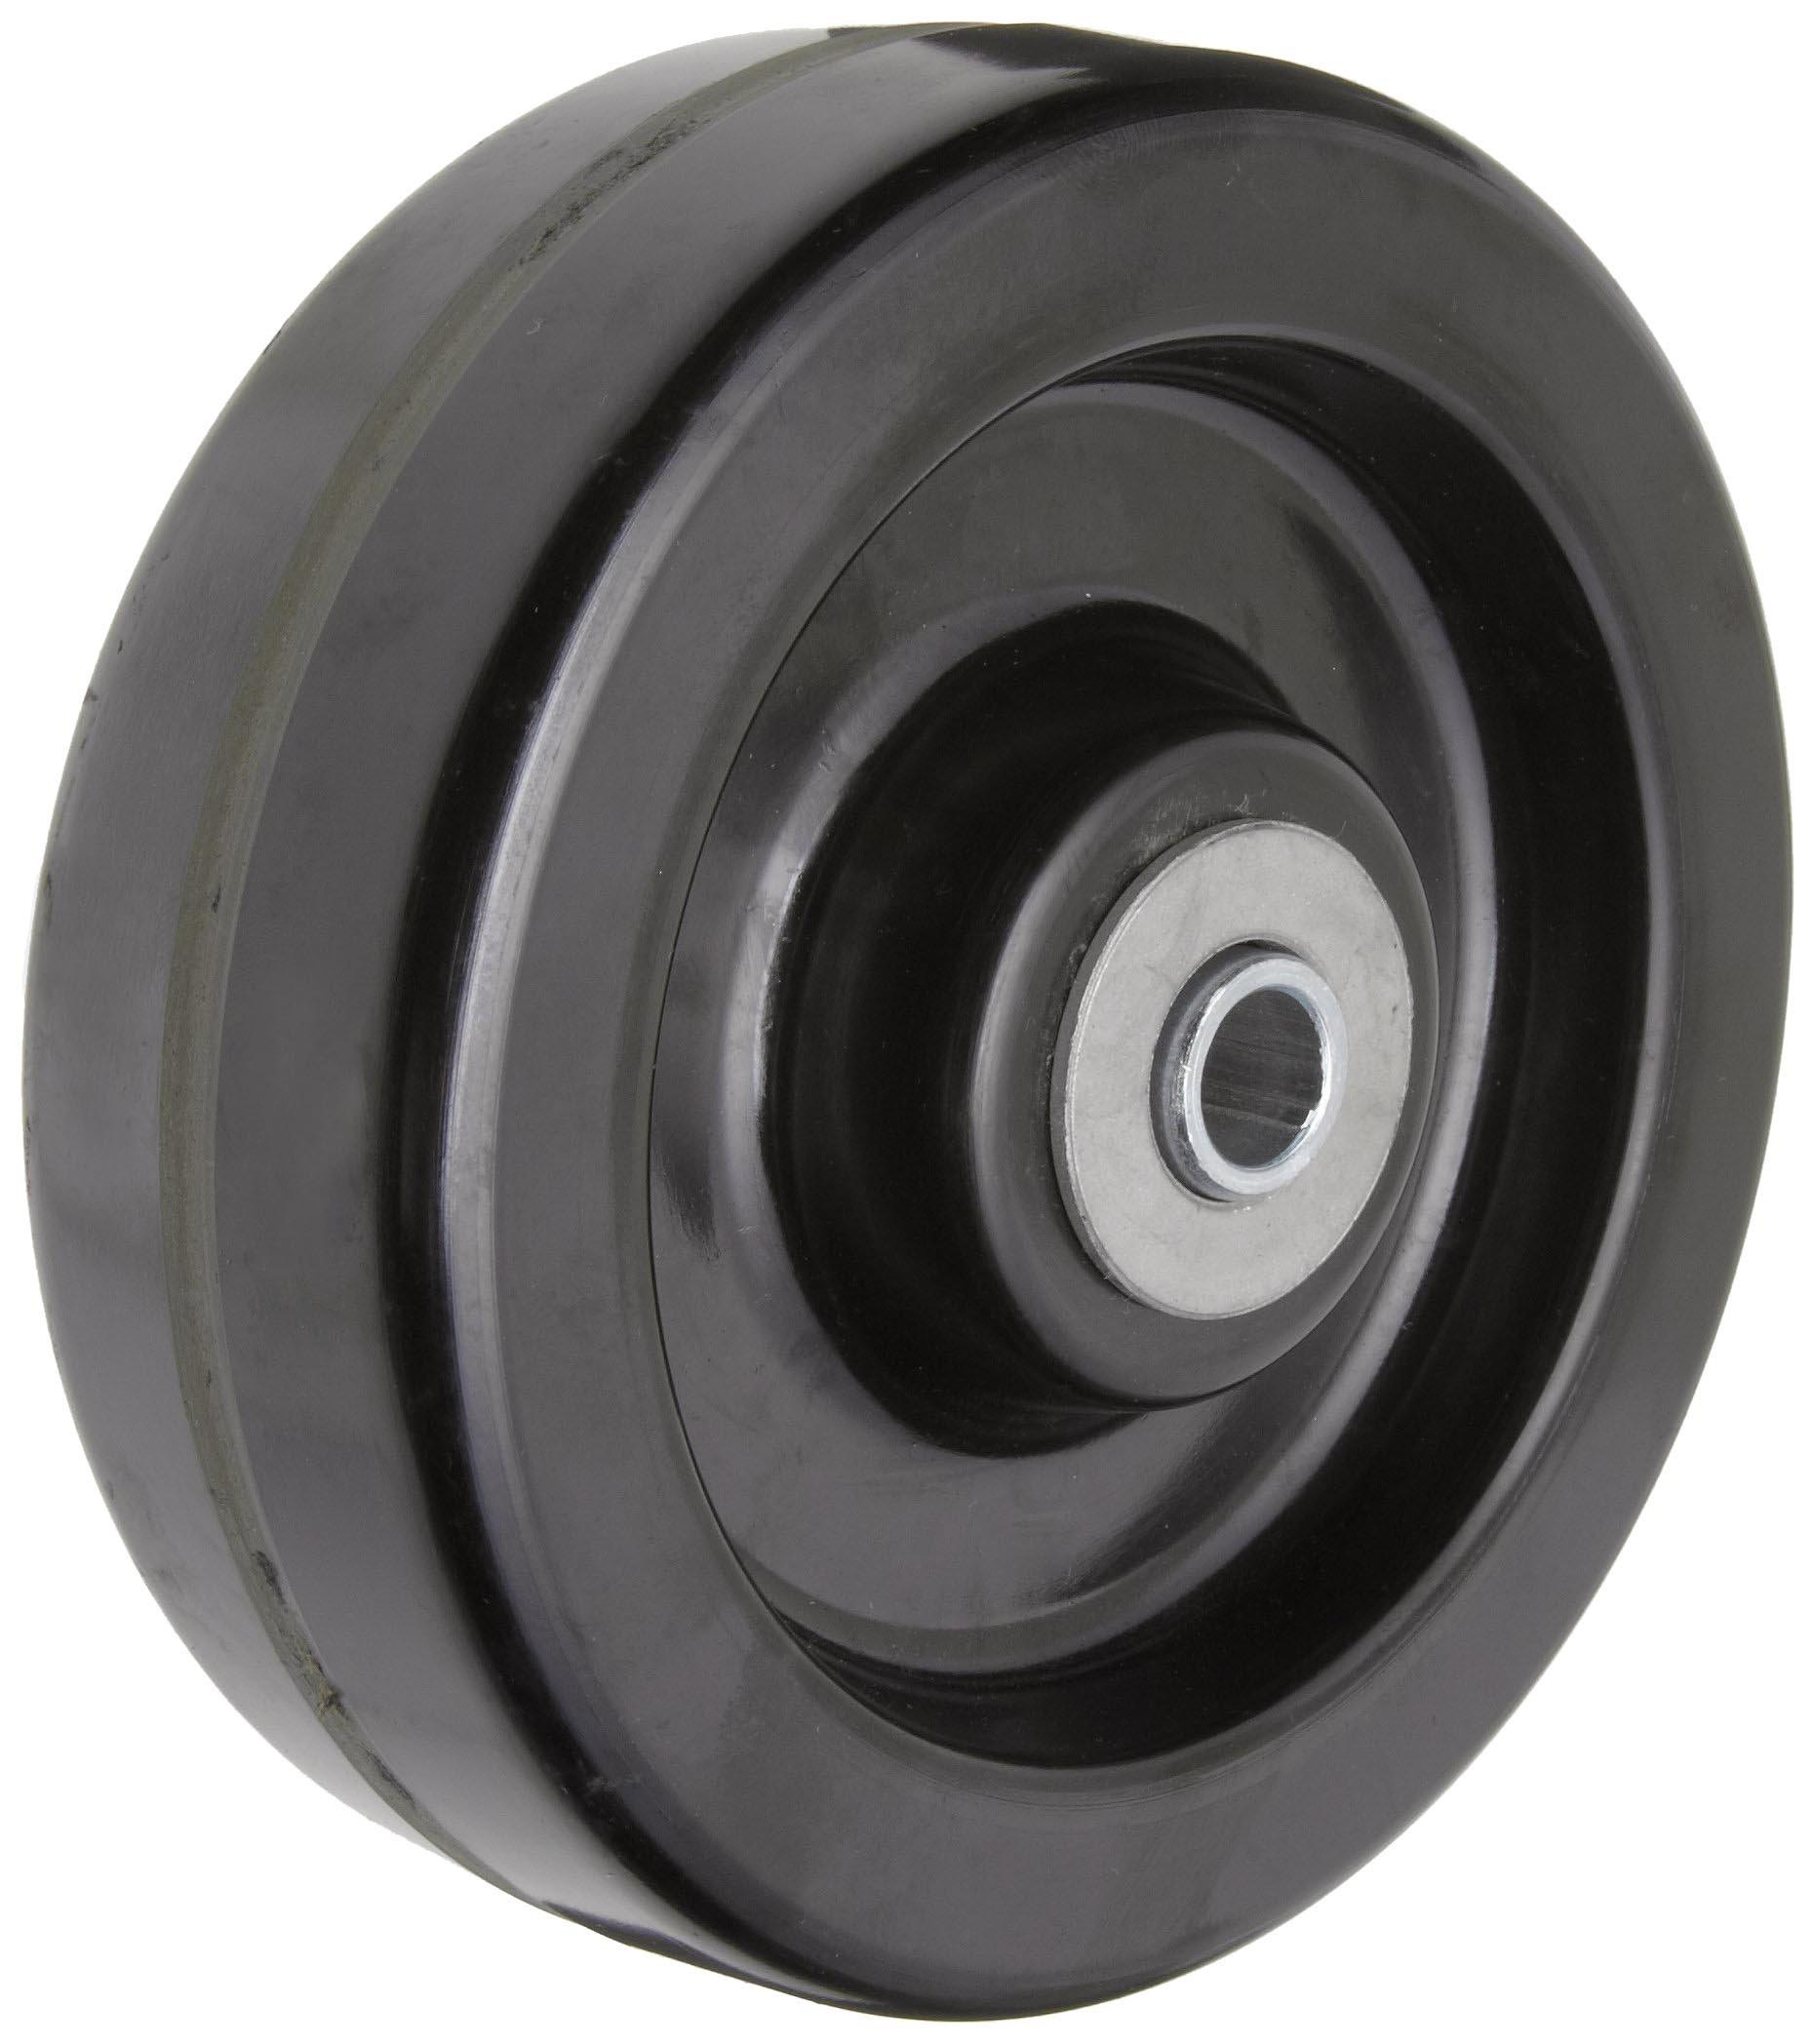 RWM Casters DUR-0620-08 6'' Diameter X 2'' Width Durastan Phenolic Wheel with Straight Roller Bearing, 1200 lbs Capacity, 1/2'' Axle Diameter